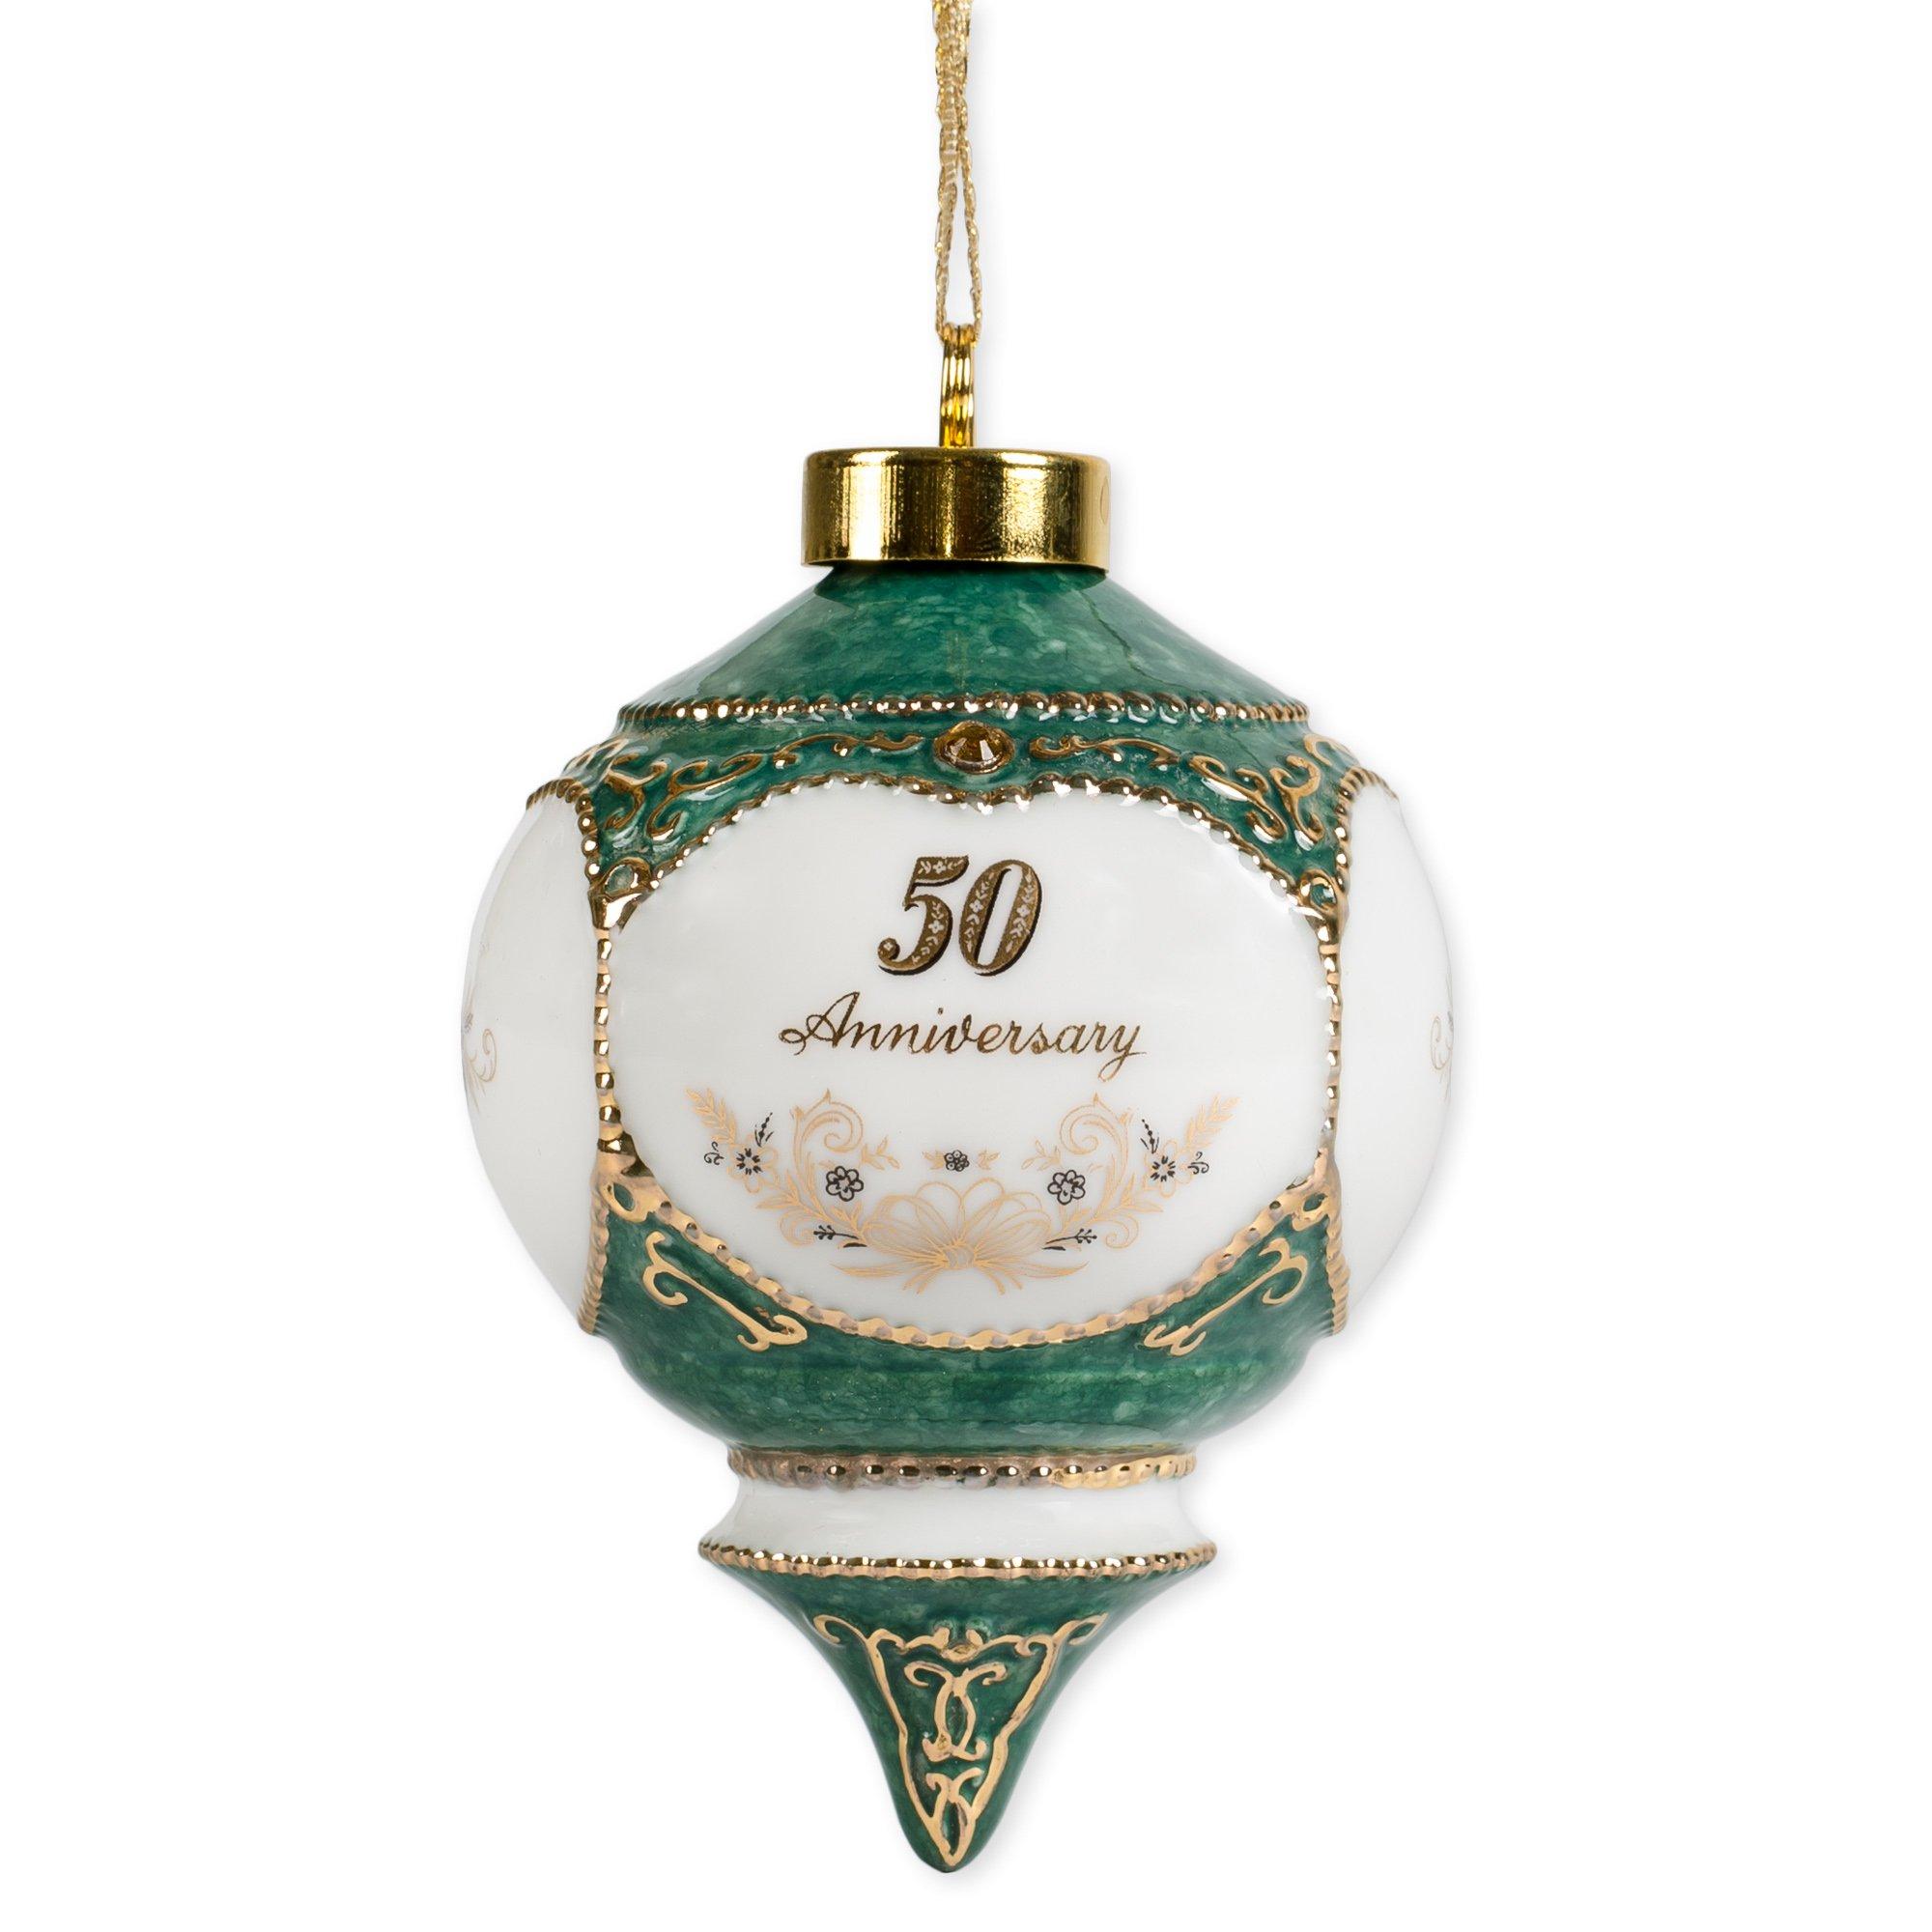 Happy 50th Wedding Anniversary Jewel Victorian 4.5 Inch Ball Hanging Ornament